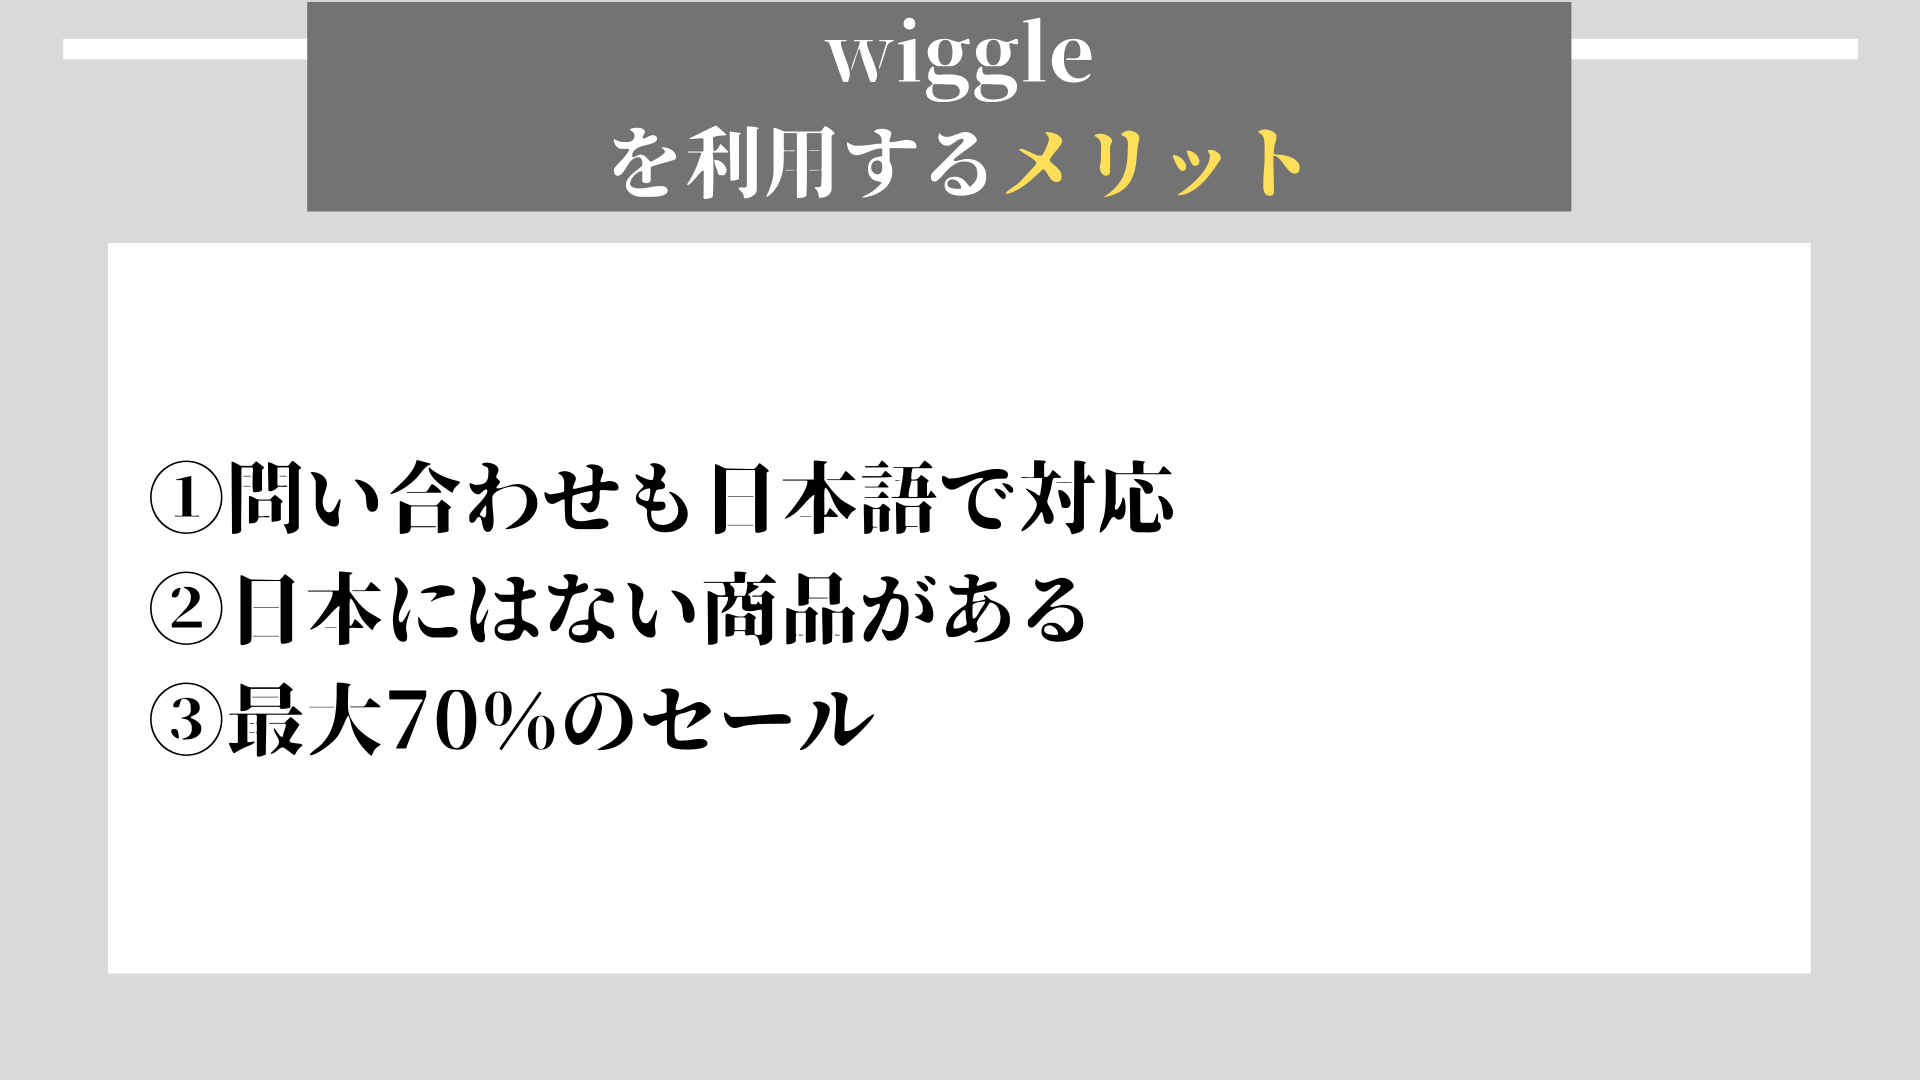 wiggle メリット